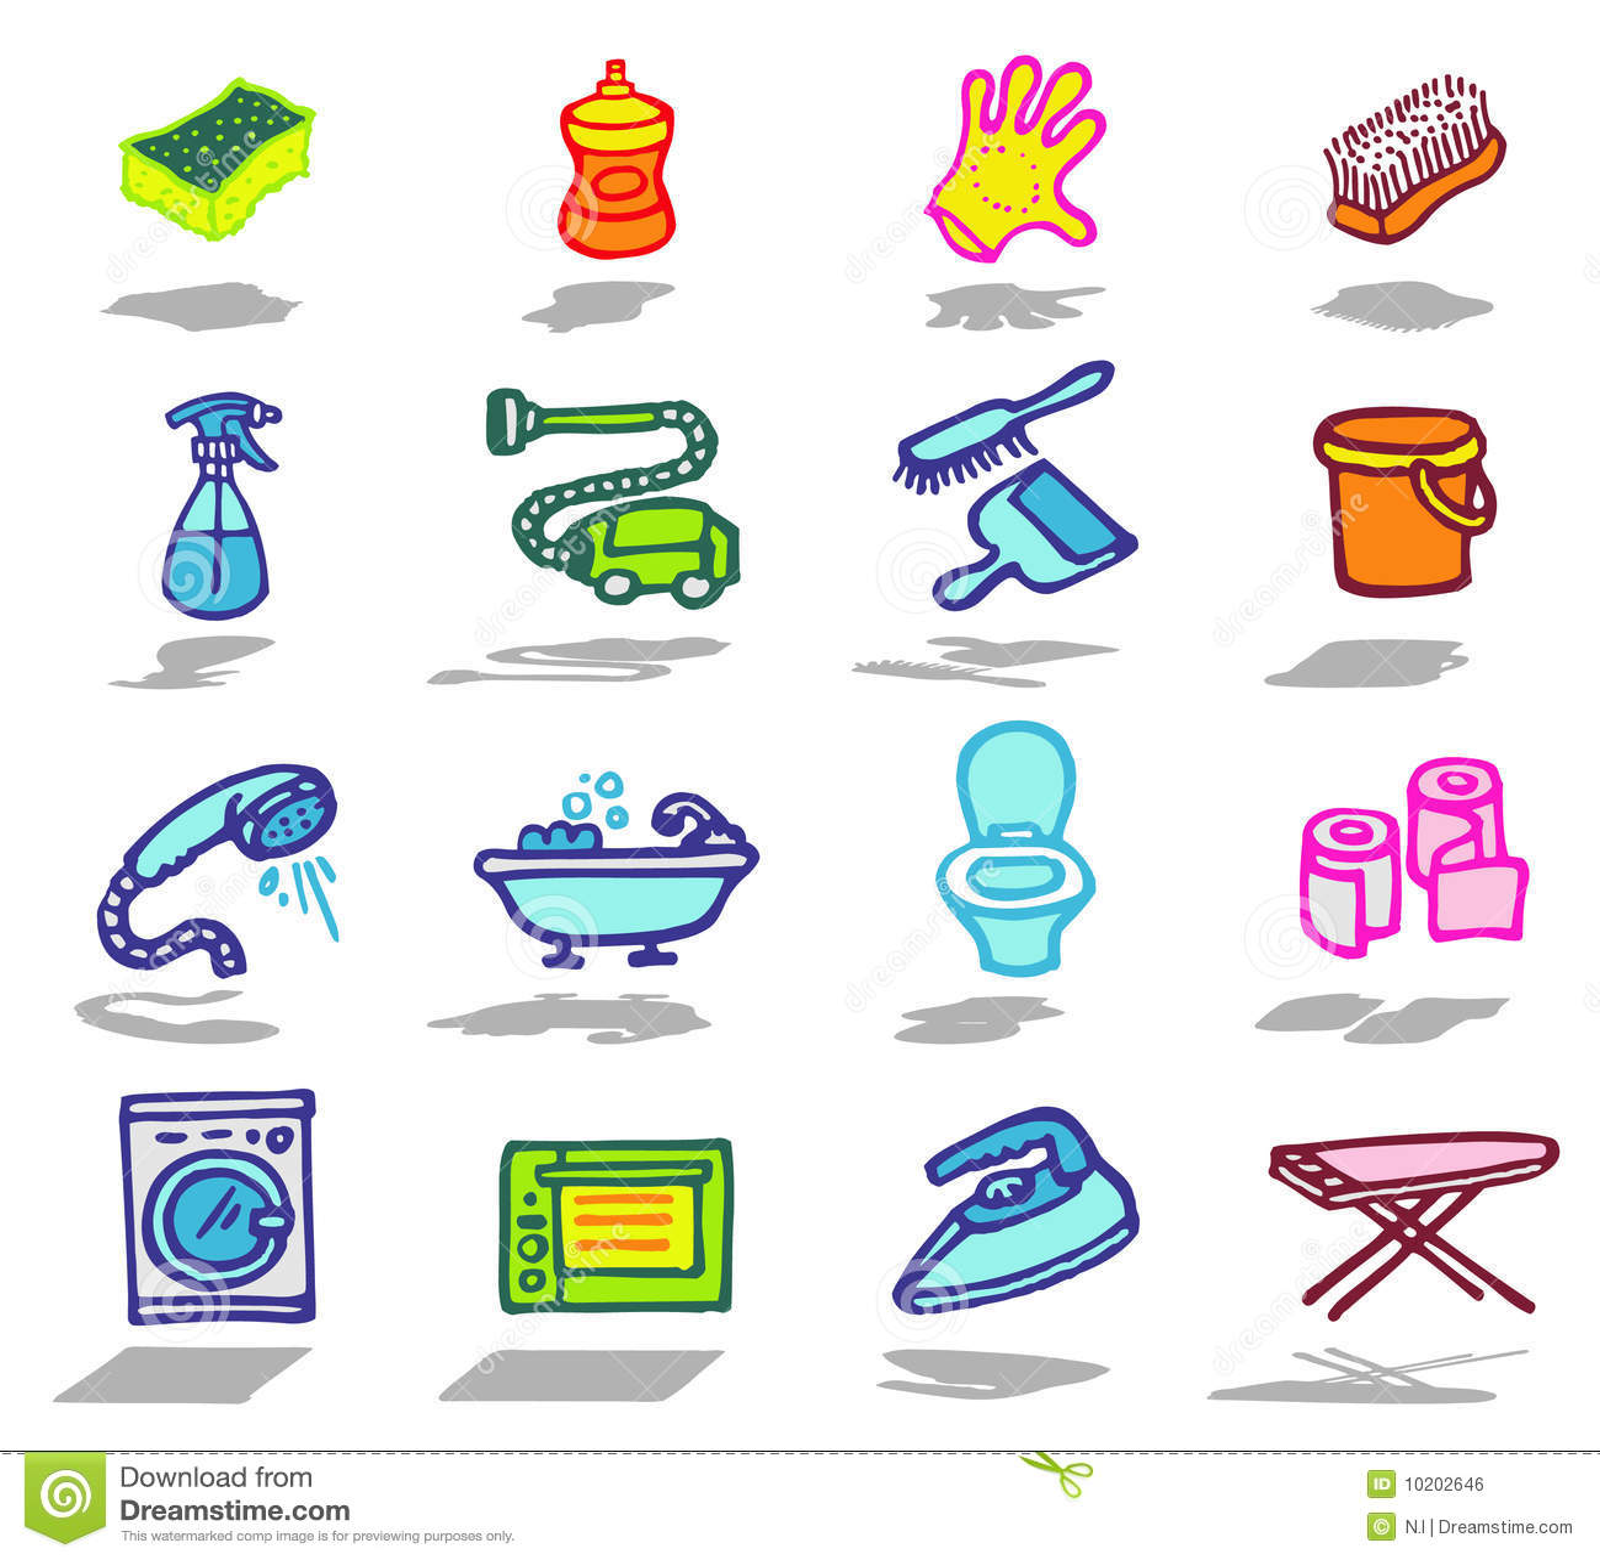 Cleaning Icons Set Royalty Free Stock Image Image 10202646